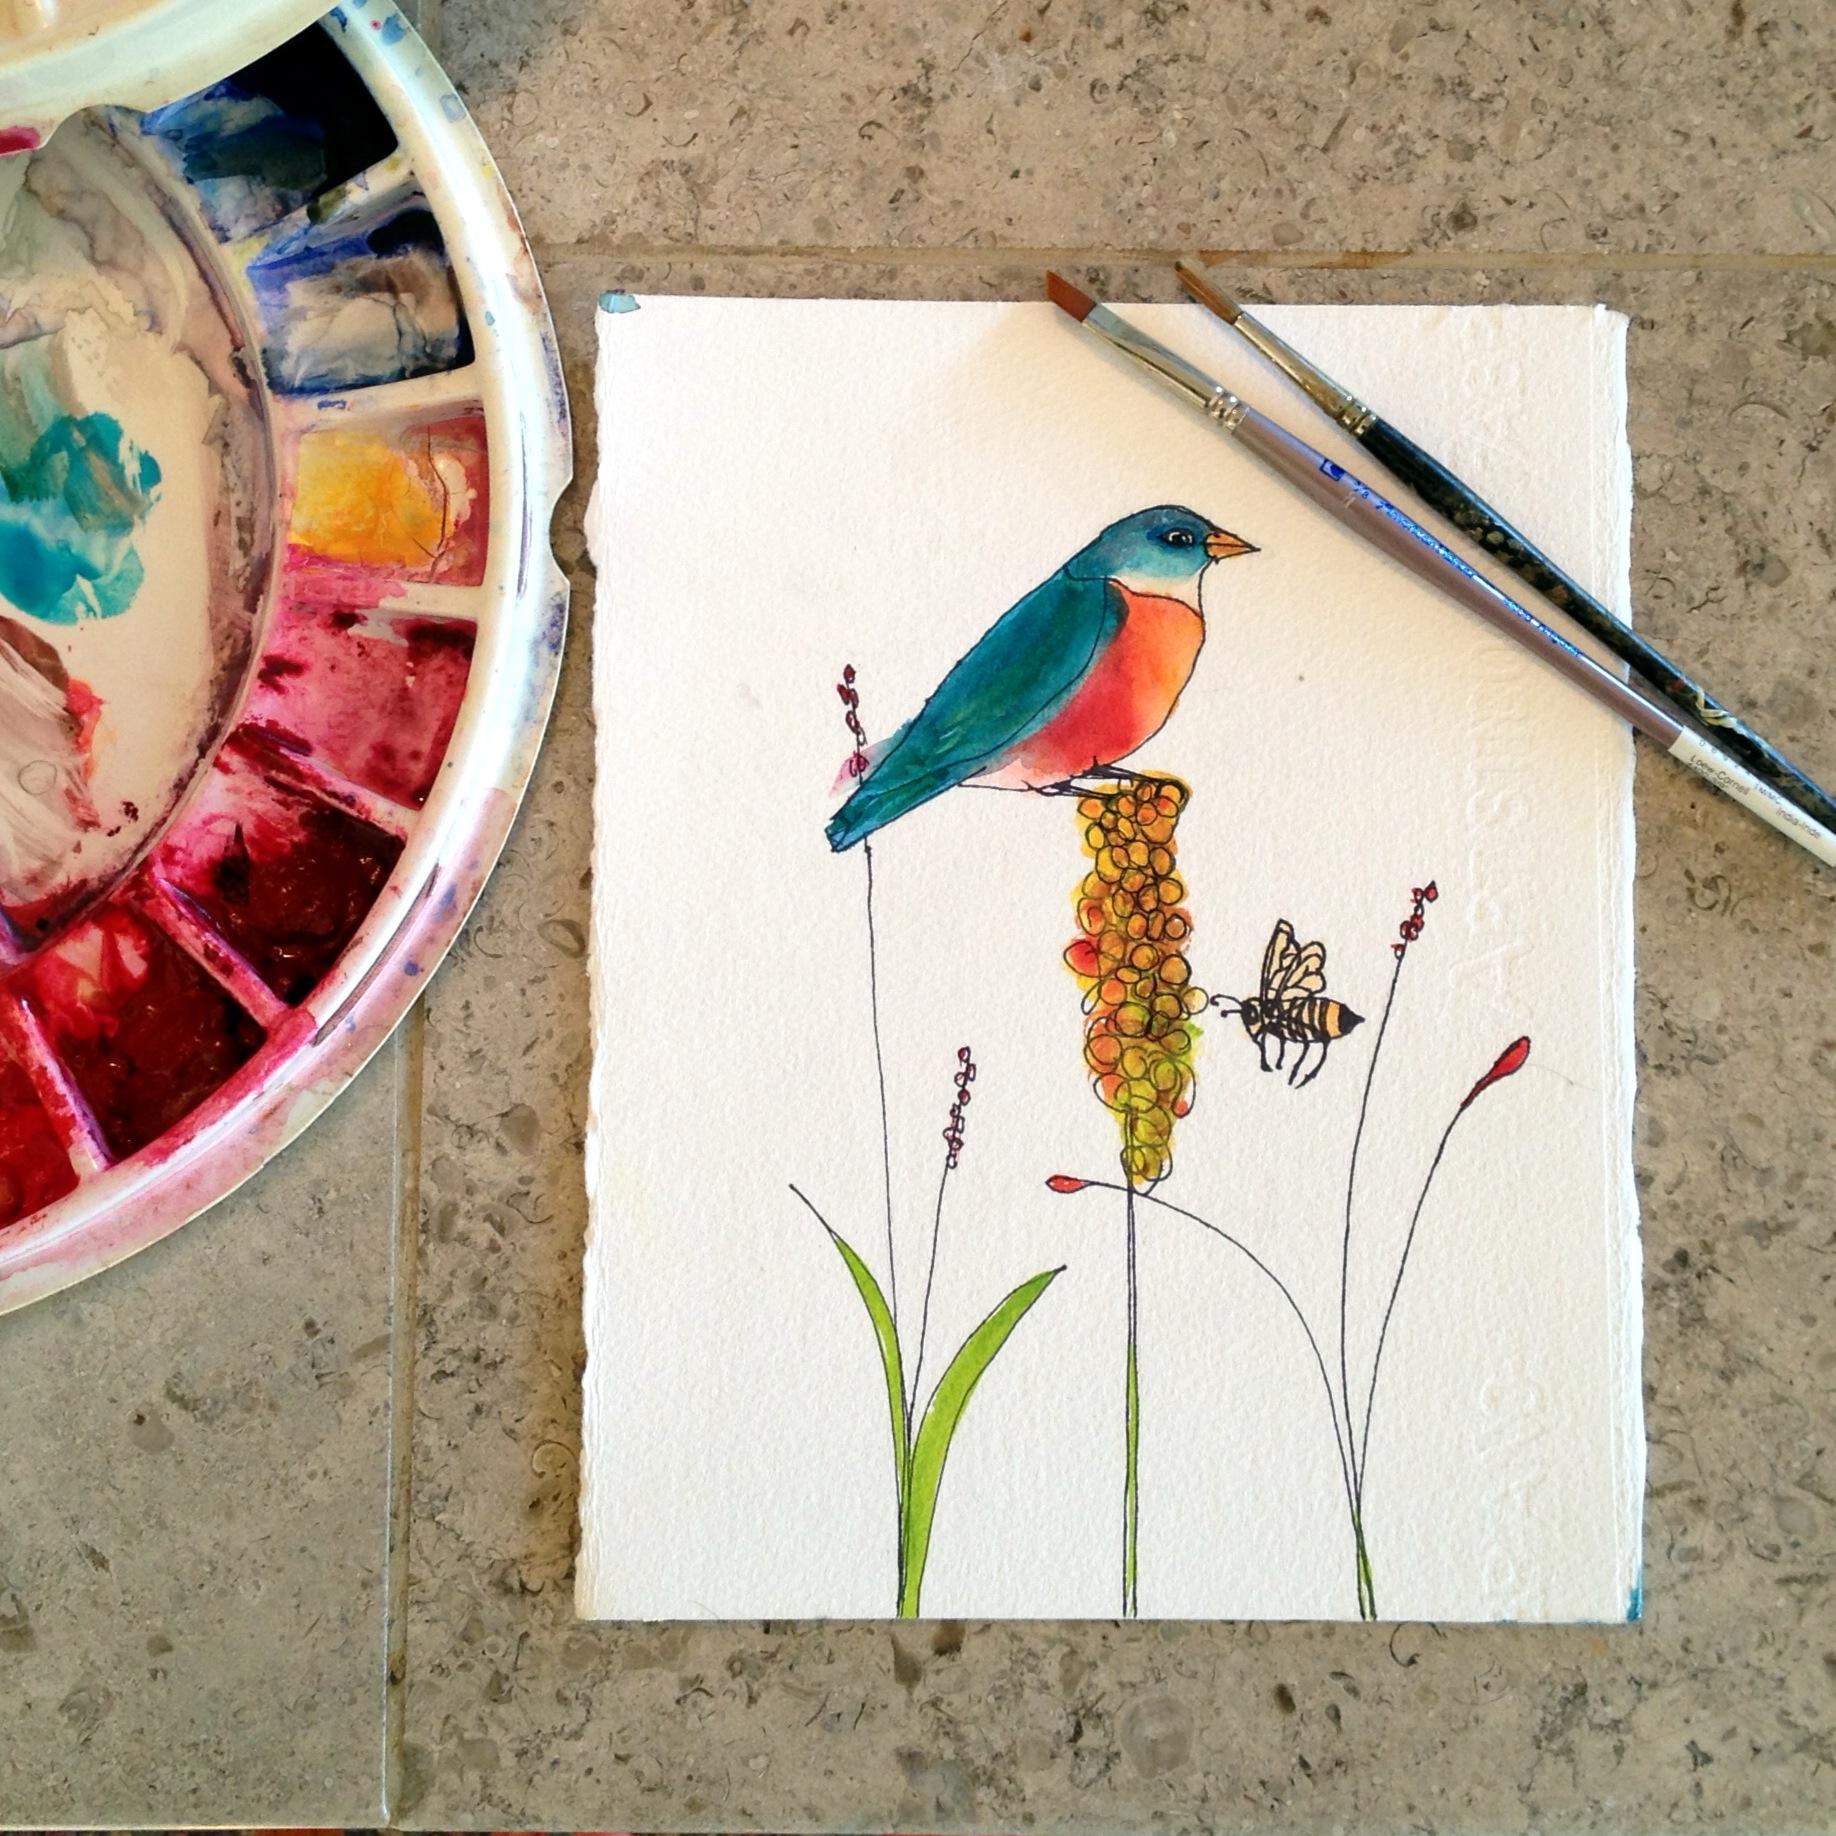 Blue bird on a grain stalk with a bee by Blenda